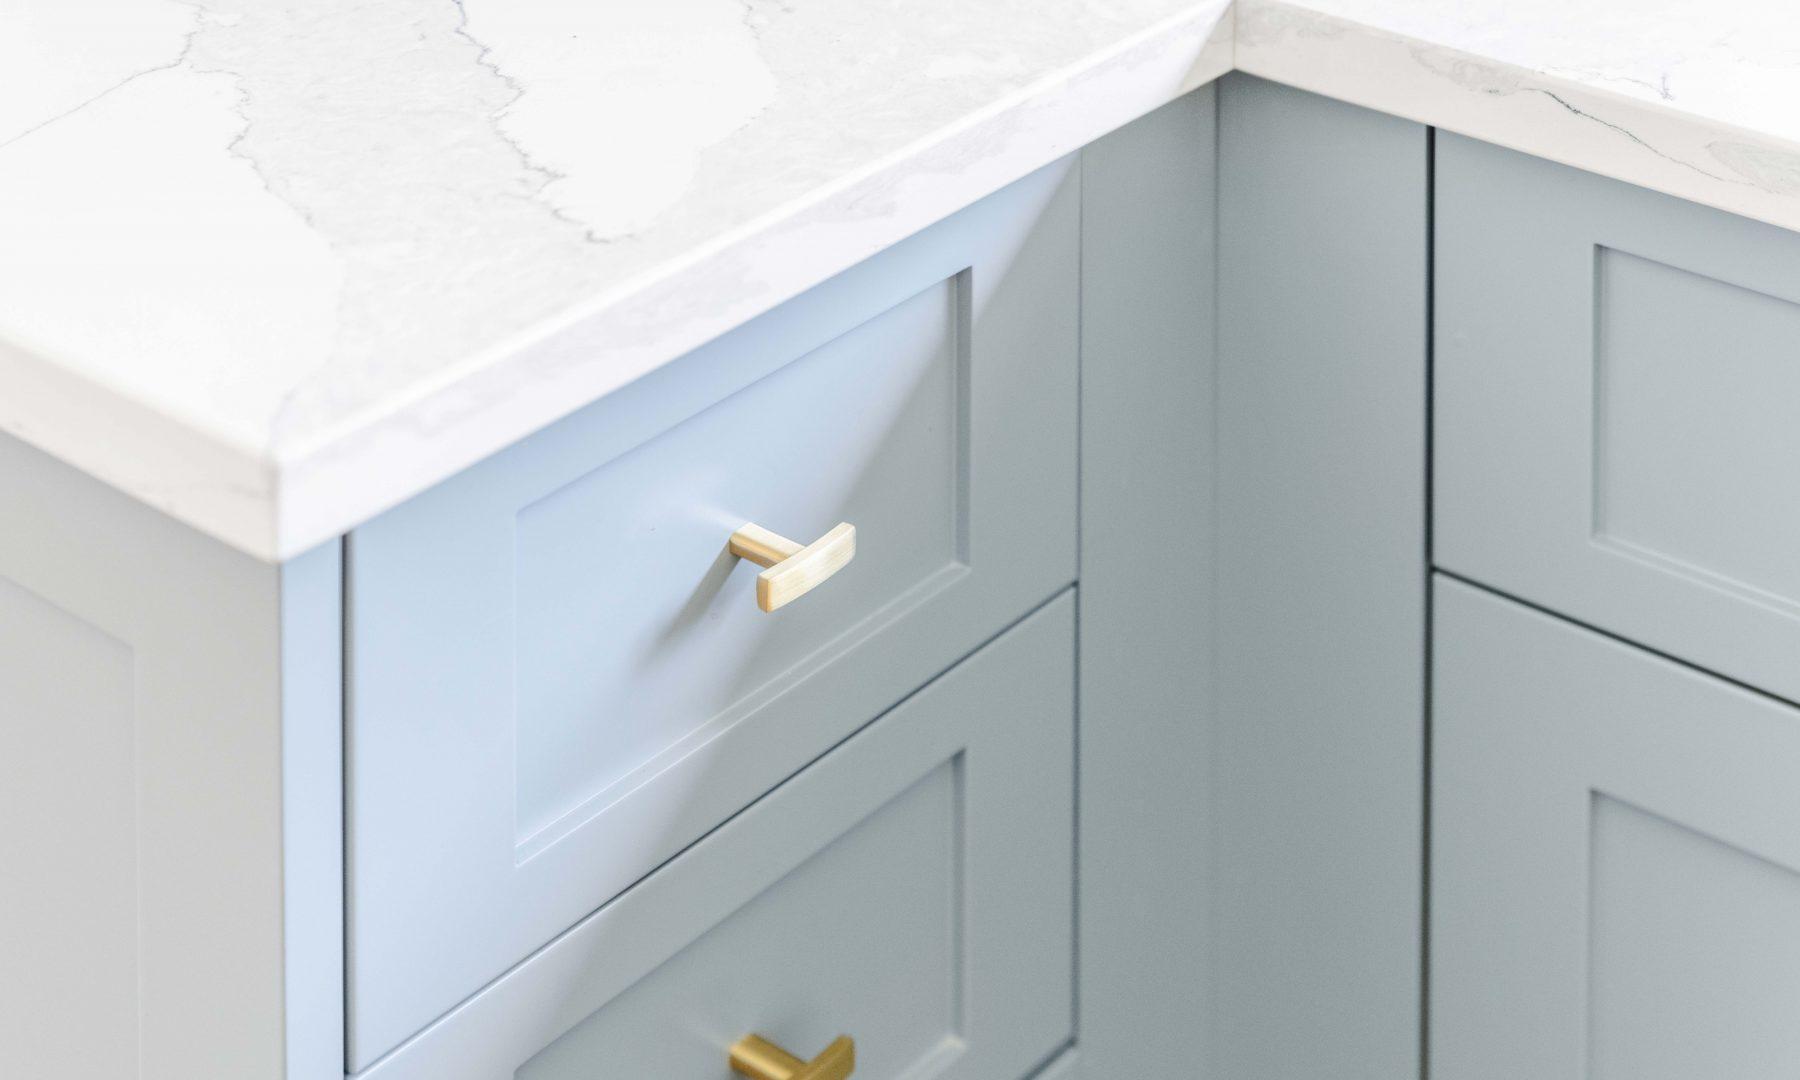 Cabico Custom Cabinets - Projet cuisine Royal Oak - vue rapprochée